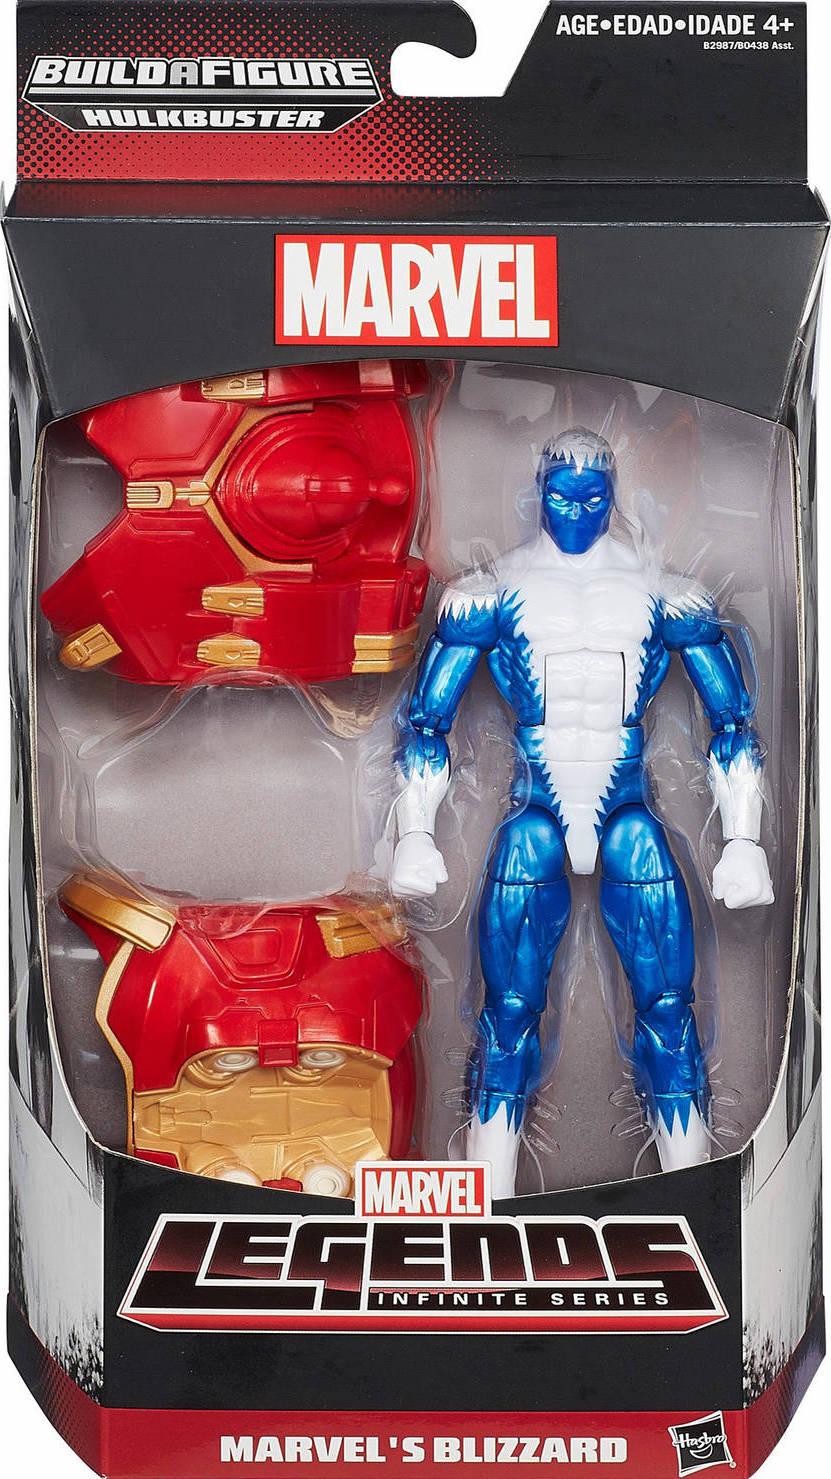 Marvel Legends Infinite Series Marvel/'s Blizzard Hulkbuster BAF NEW//SEALED